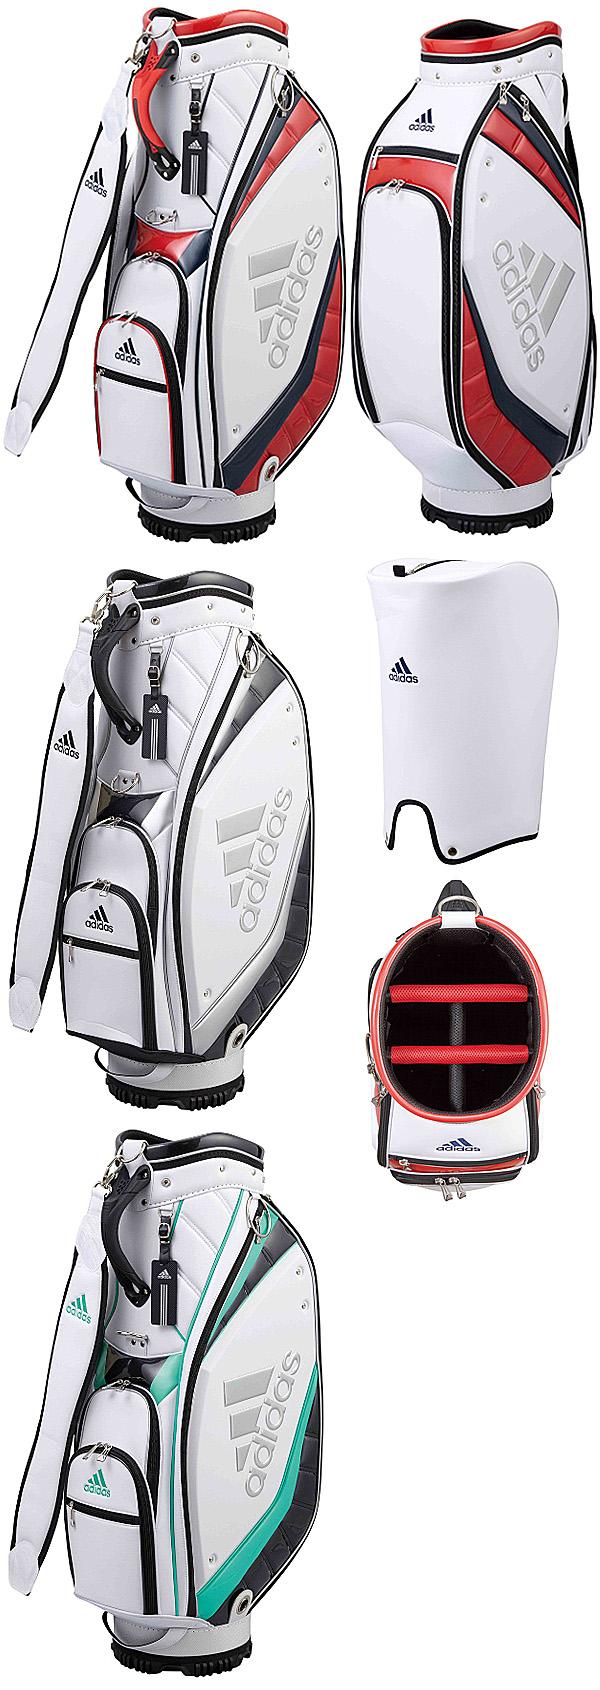 215a673f19 Adidas Golf Japan 2018 Spring Summer SILVER Logo Caddie Cart Bag - Golf  Japan - Pro Golf Japan